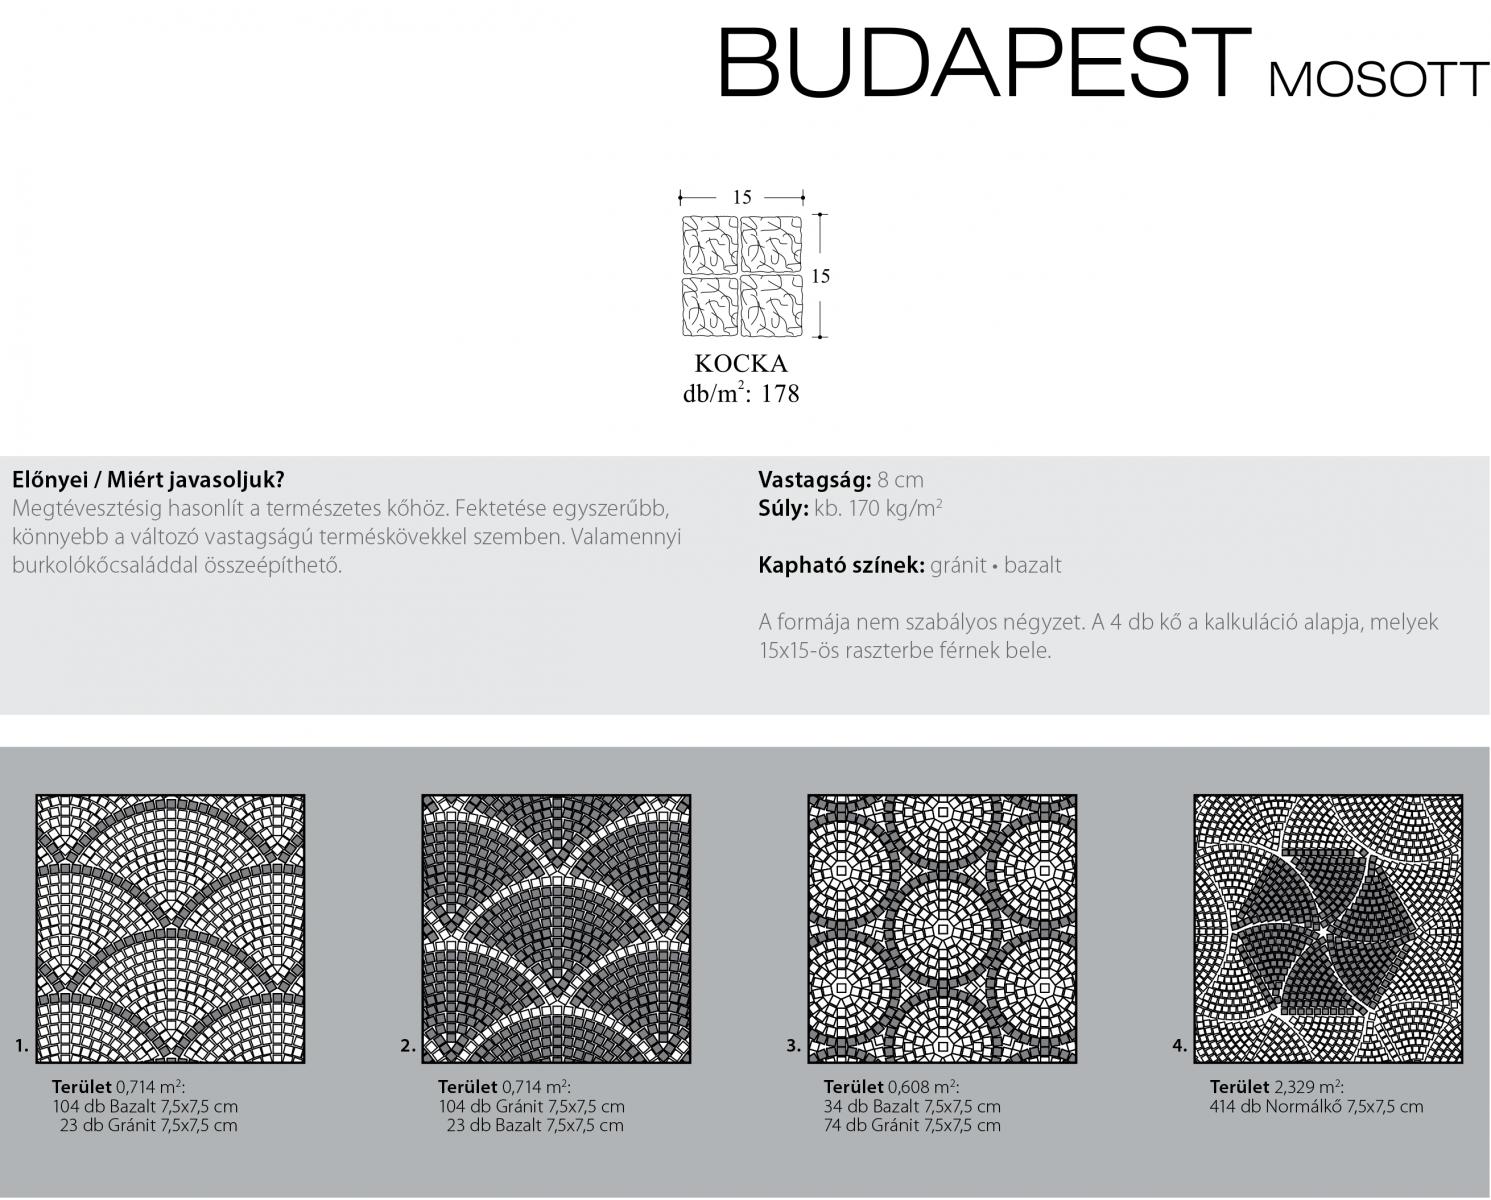 Budapest technikai információi